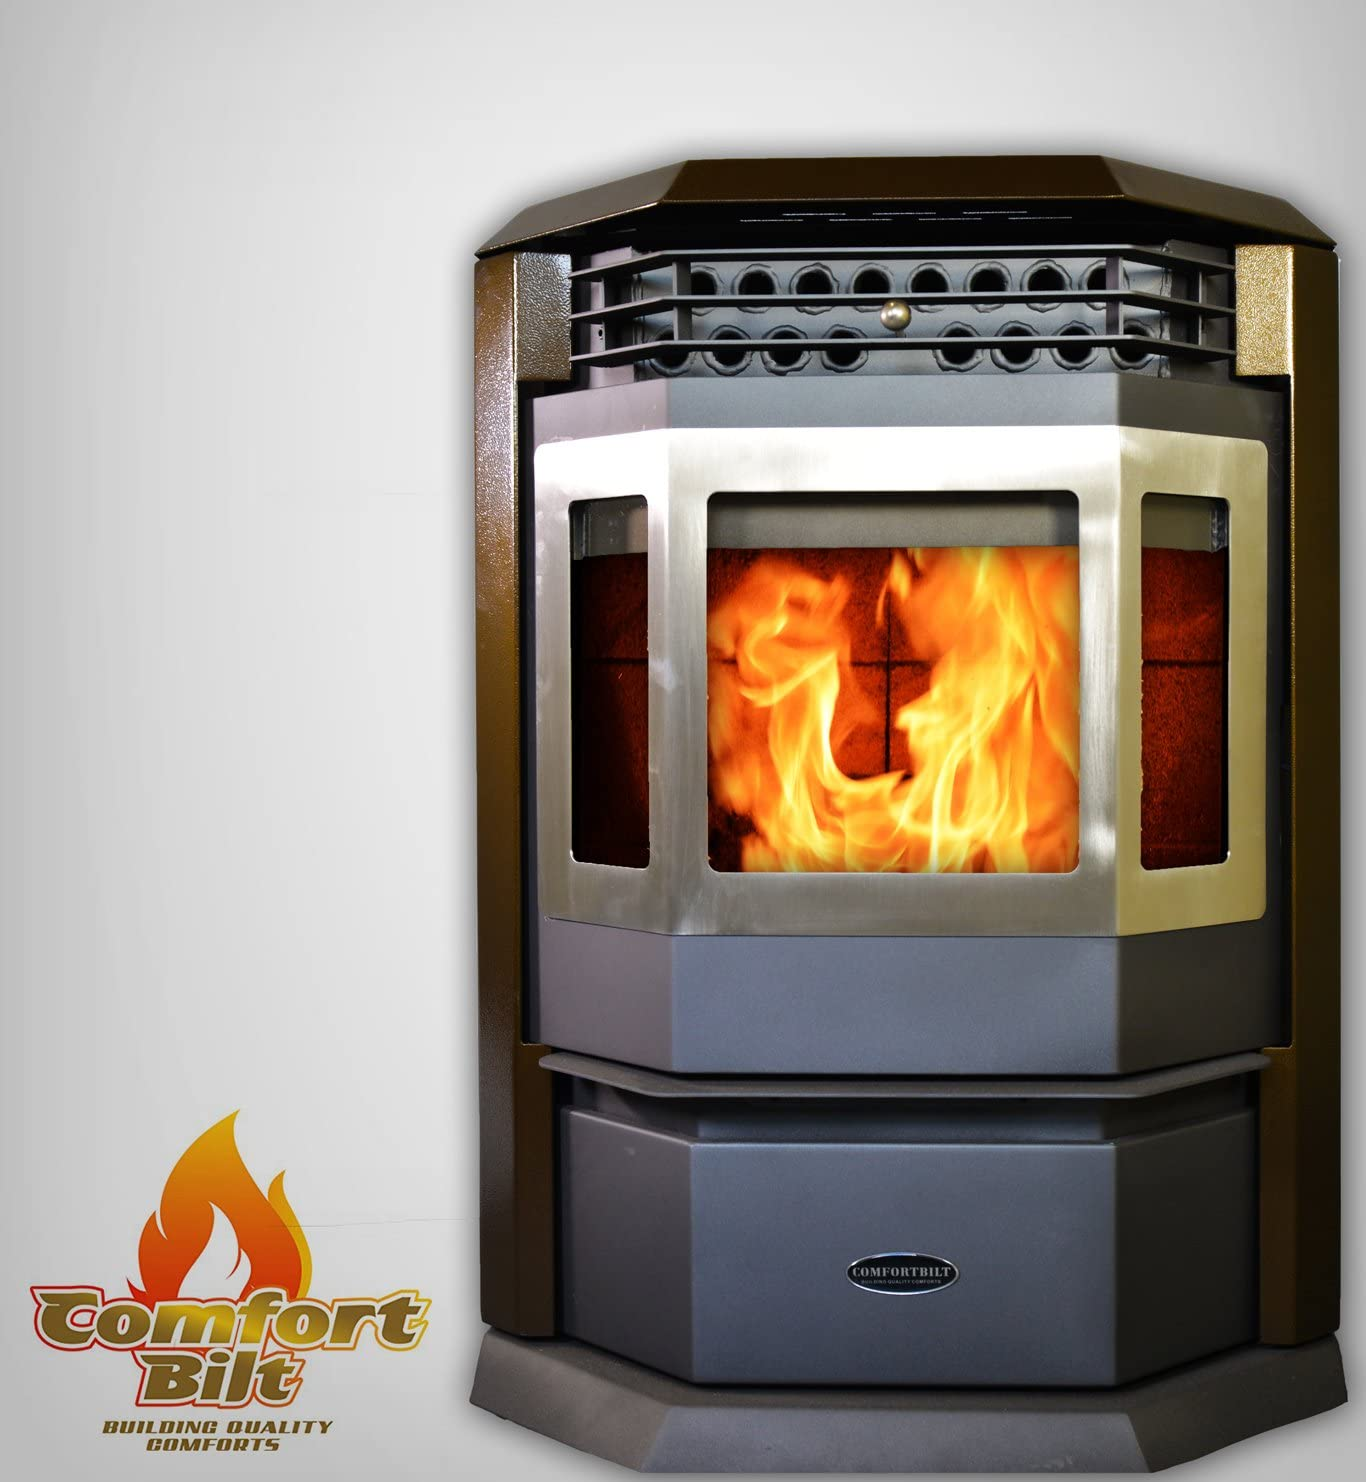 Comfortbilt Pellet Stove HP22-SS- 50,000 btu - Stainless Steel Golden Brown!